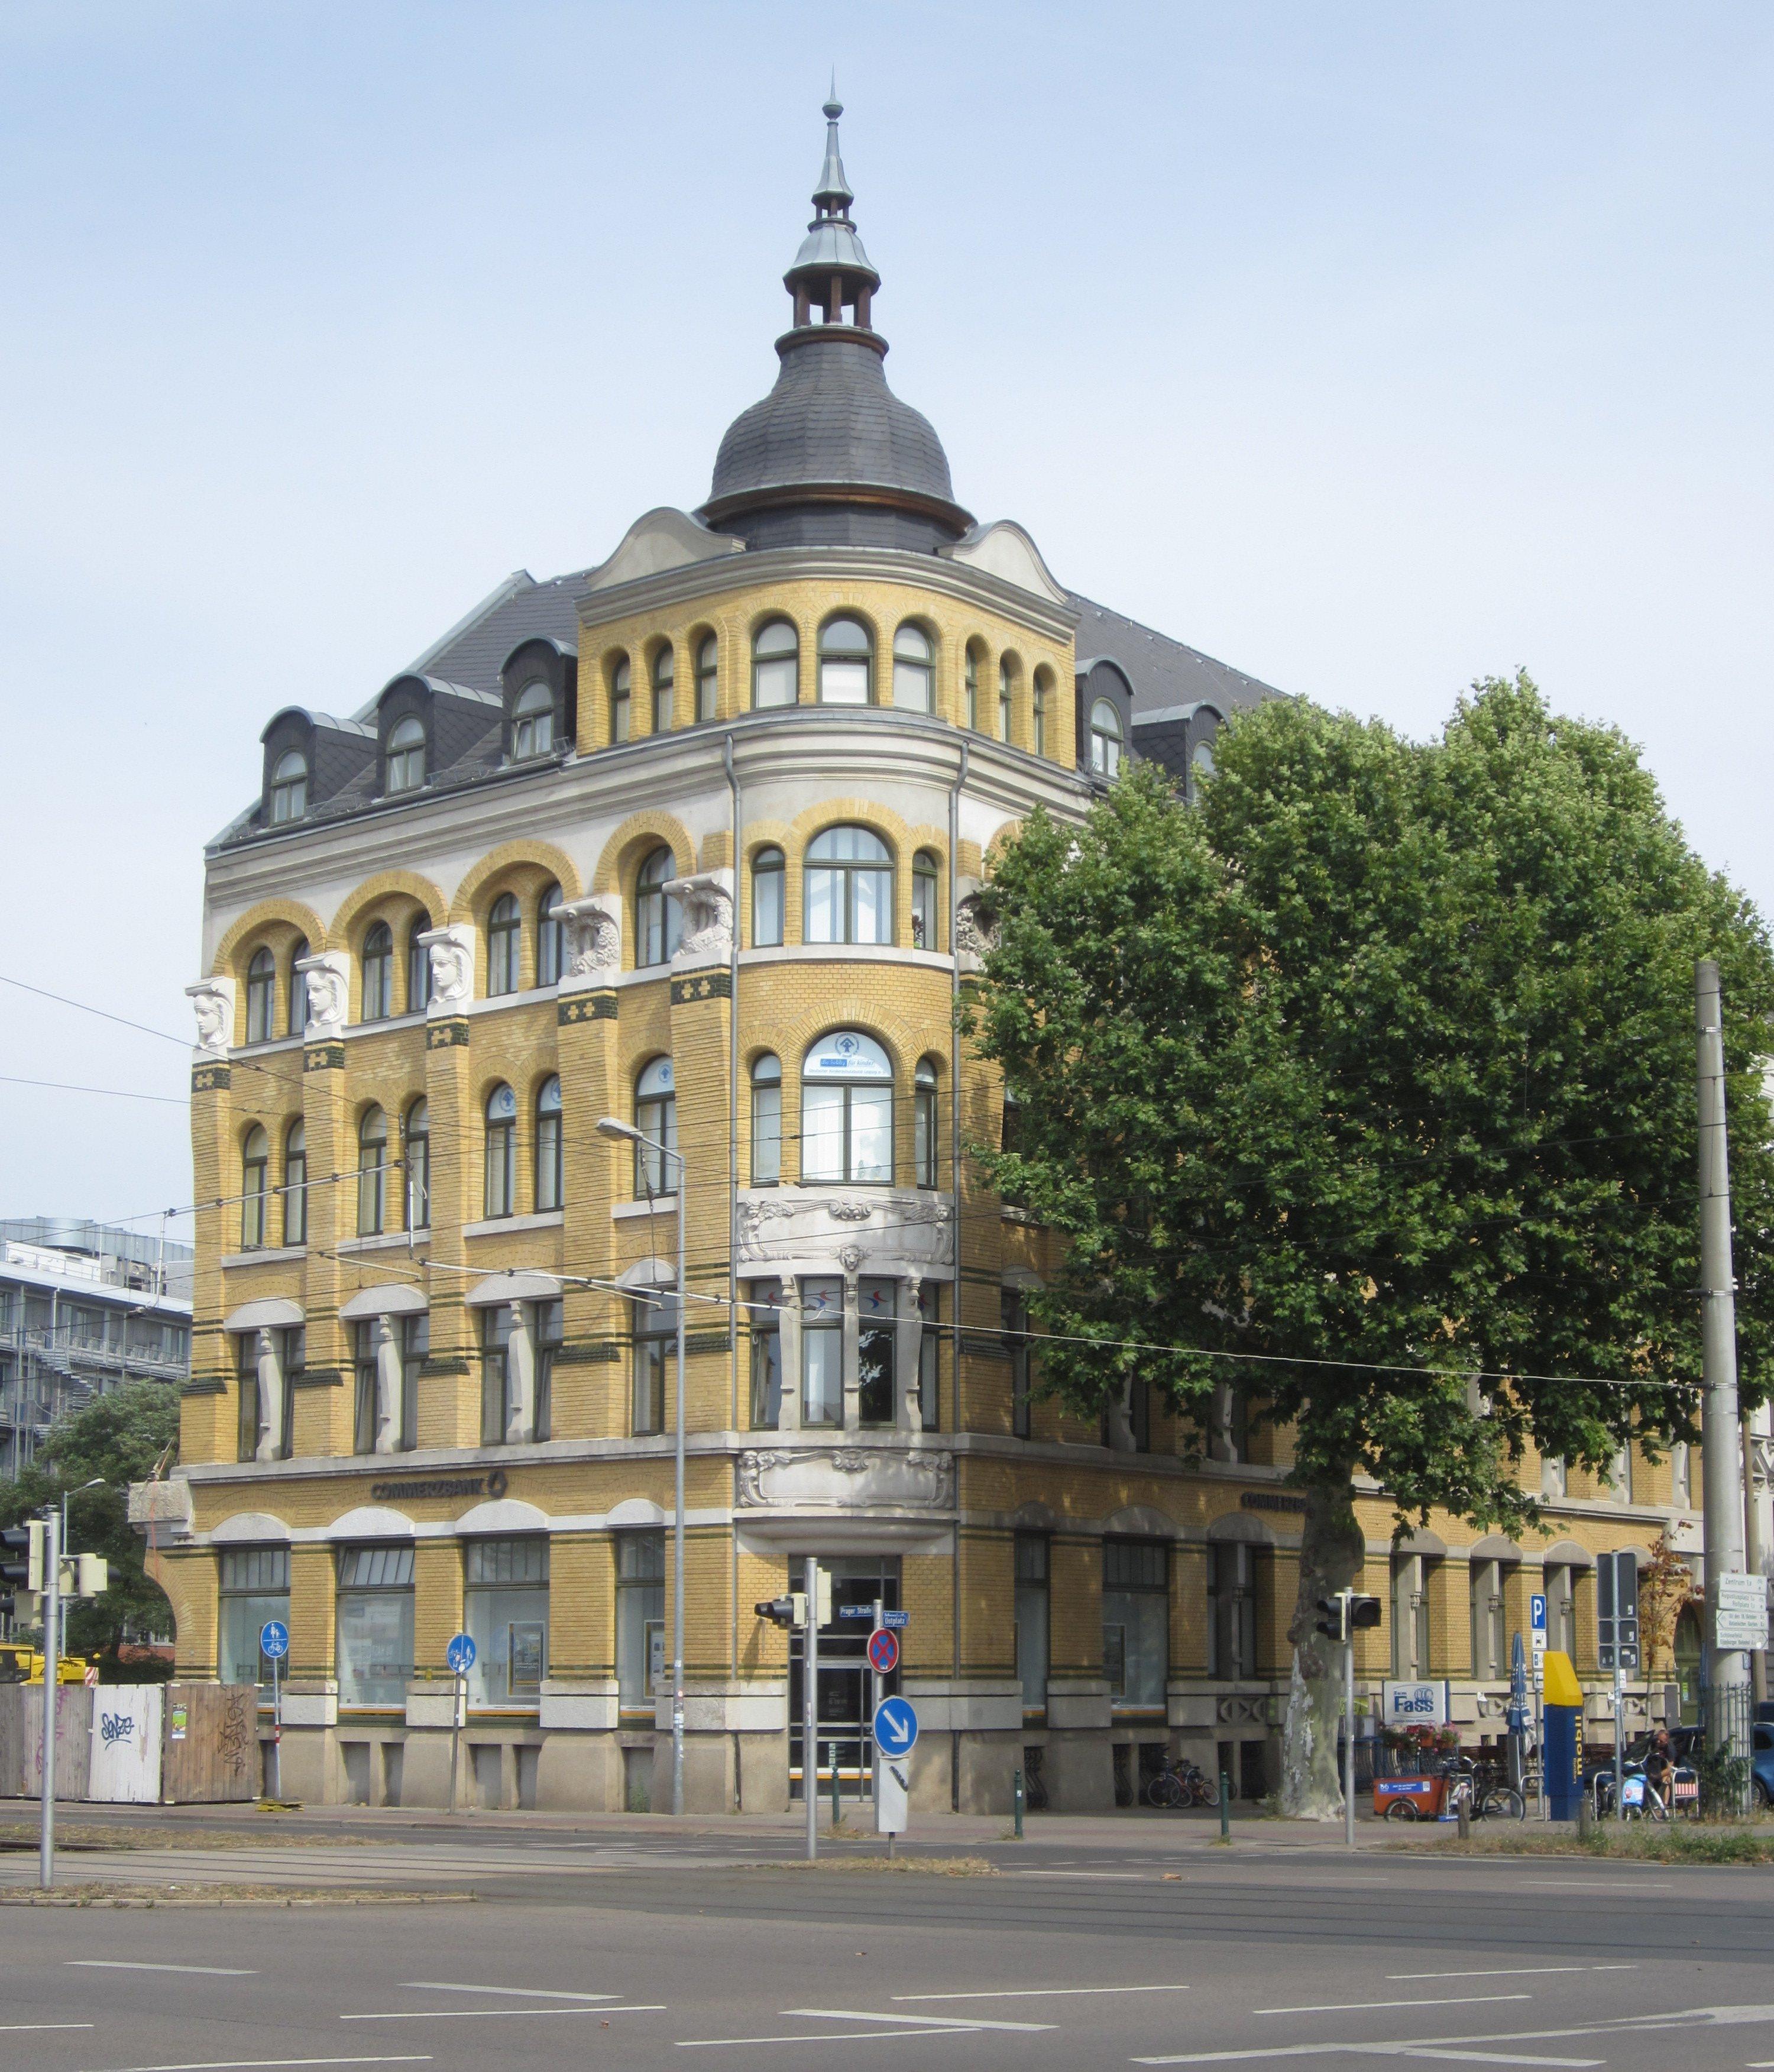 Ostplatz Leipzig file ostplatz leipzig 2016 002 jpg wikimedia commons